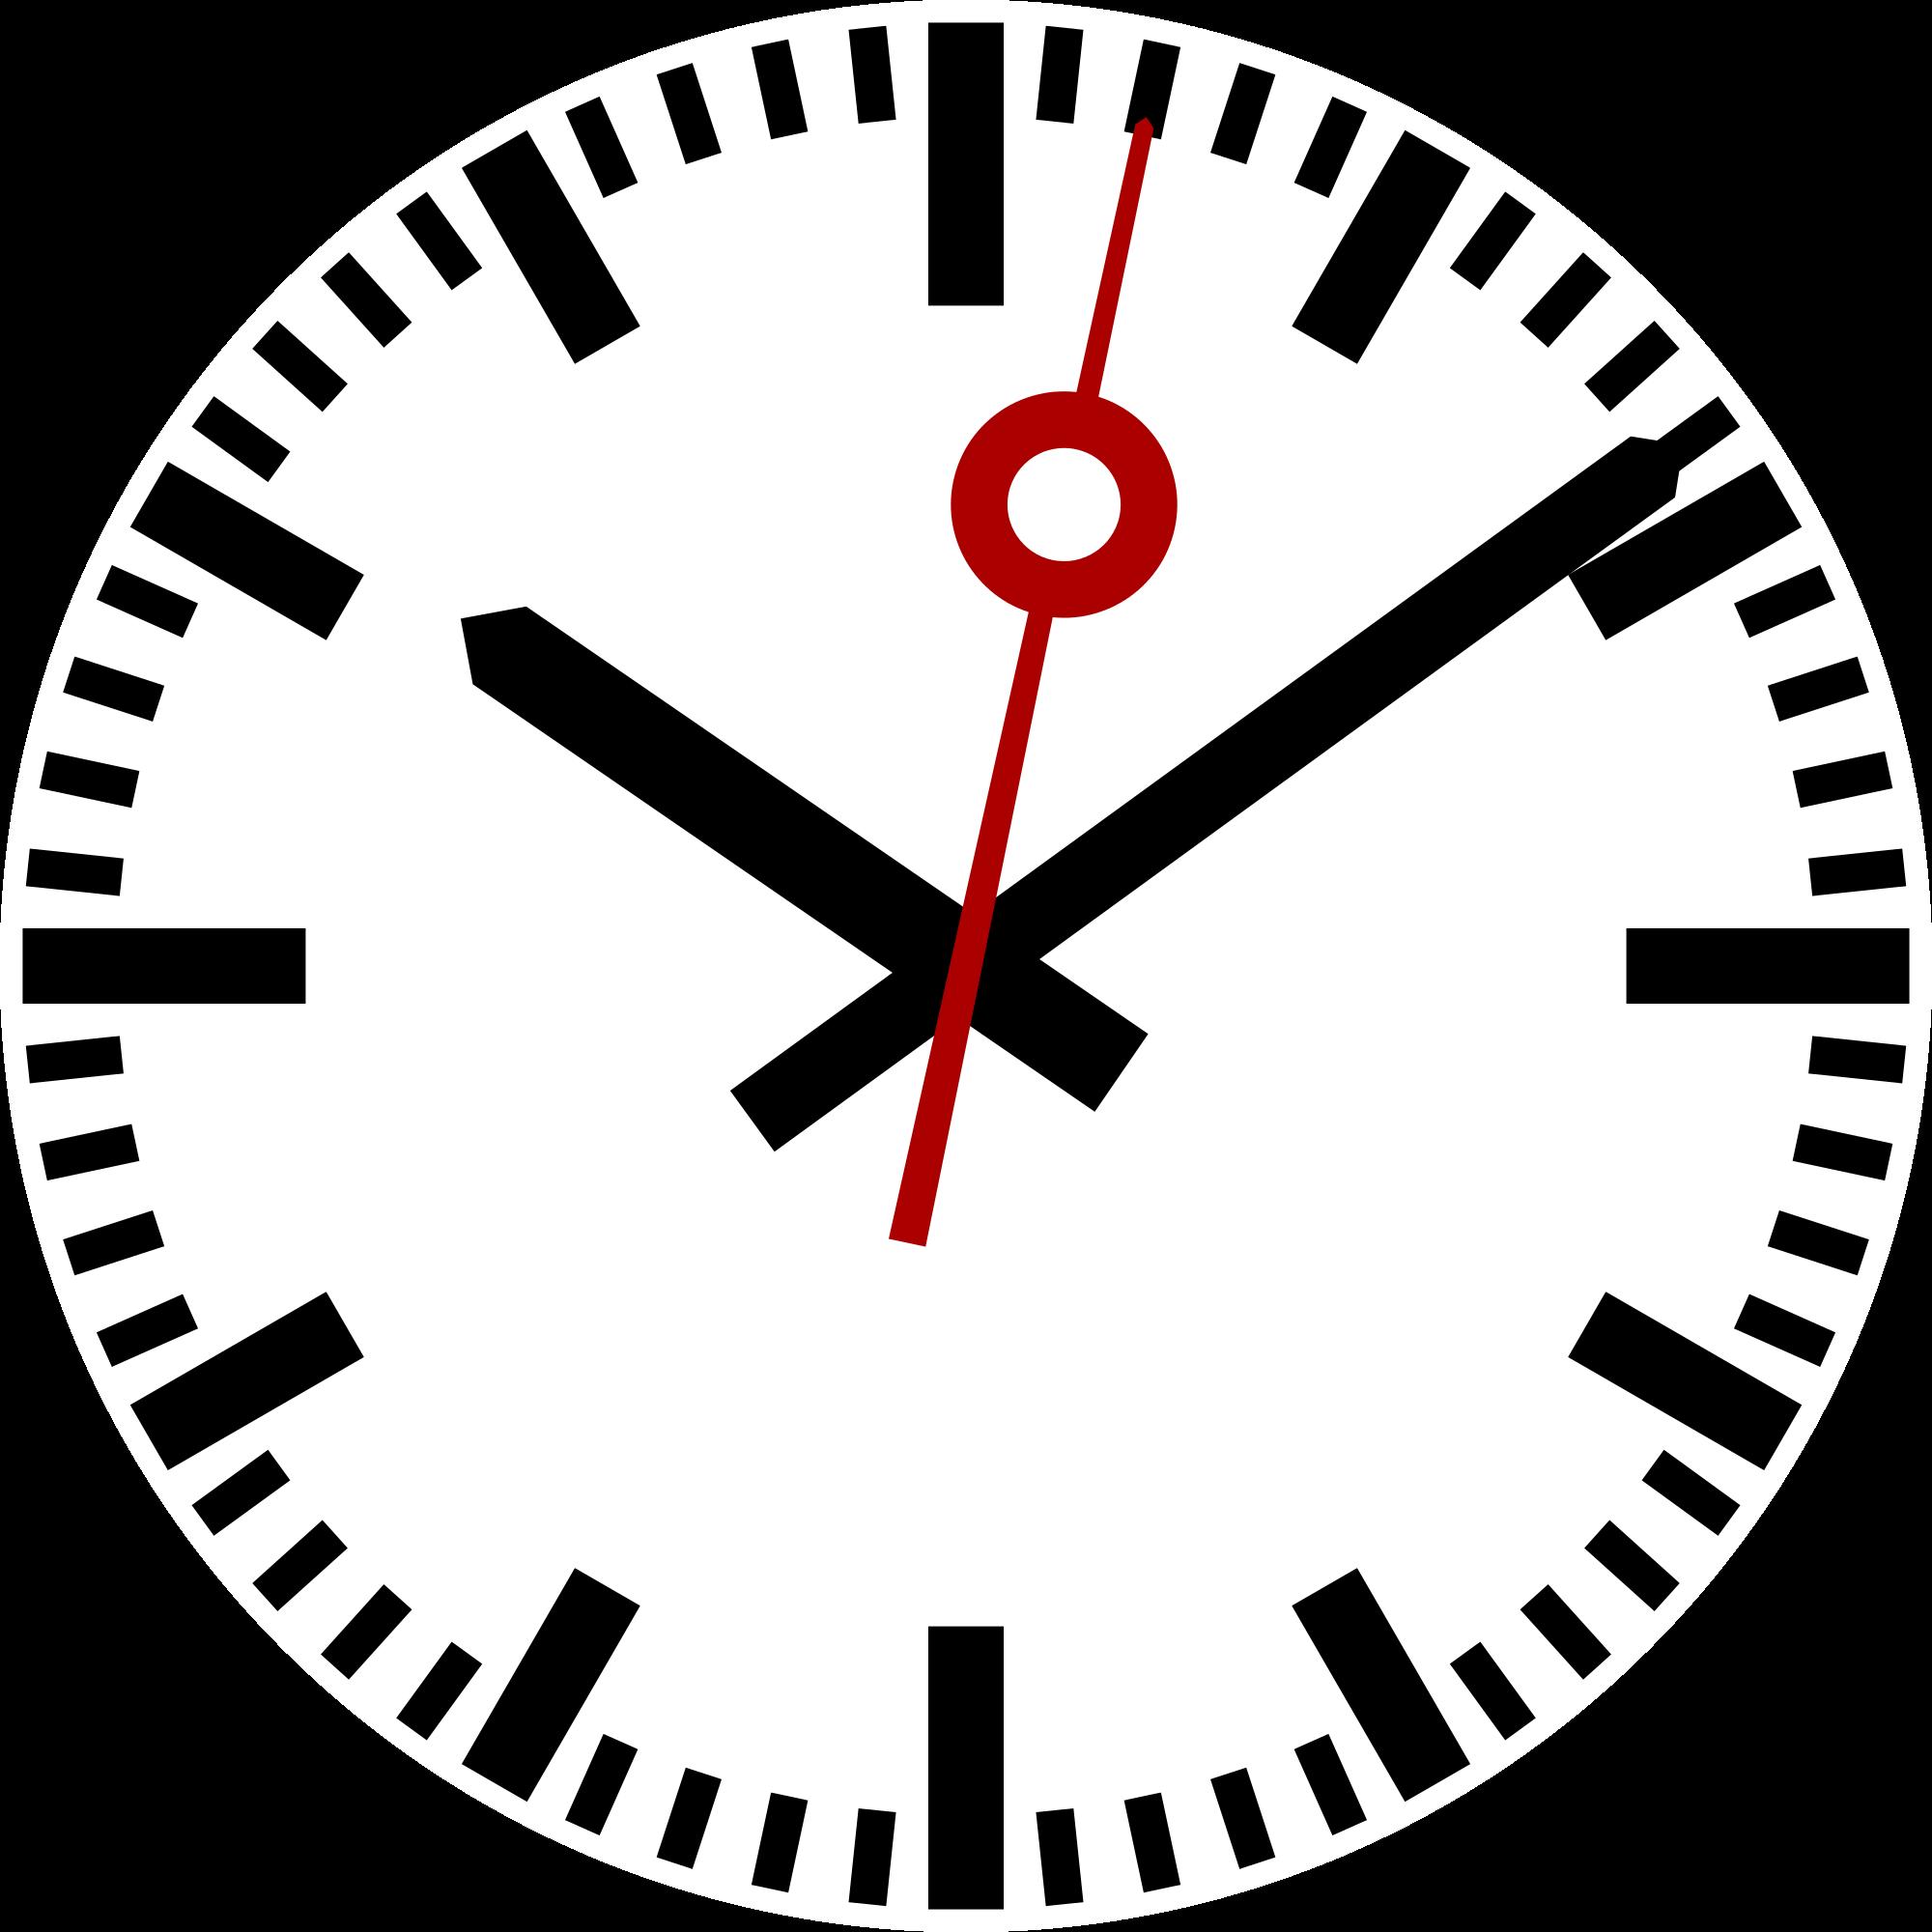 Vintage Clock Face Transparent Wikimedia Commons Clipart